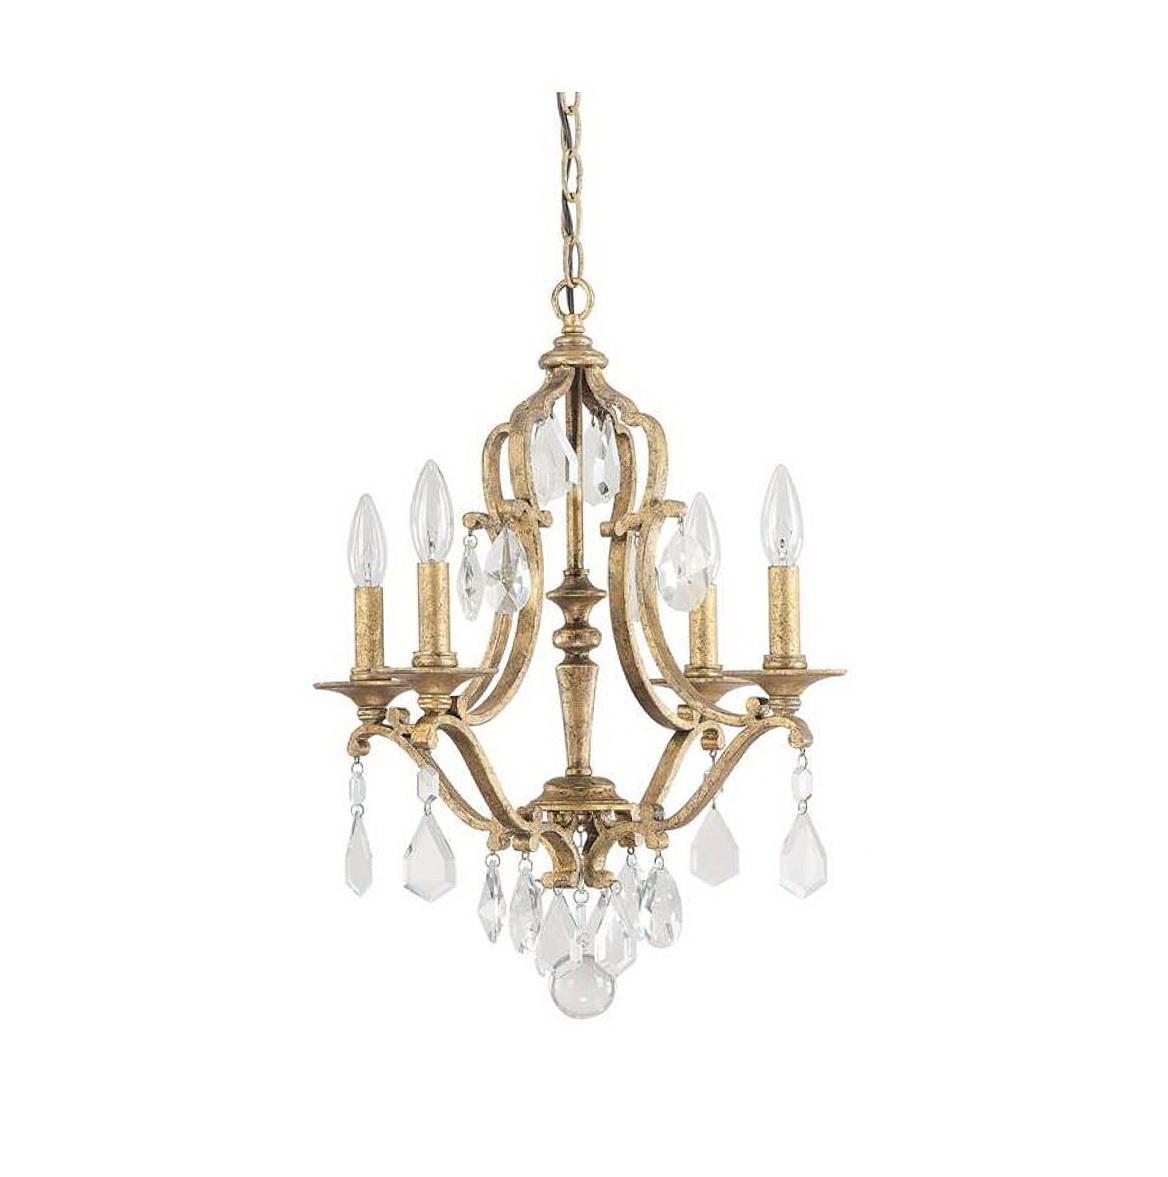 Antique Gold Crystal Chandelier